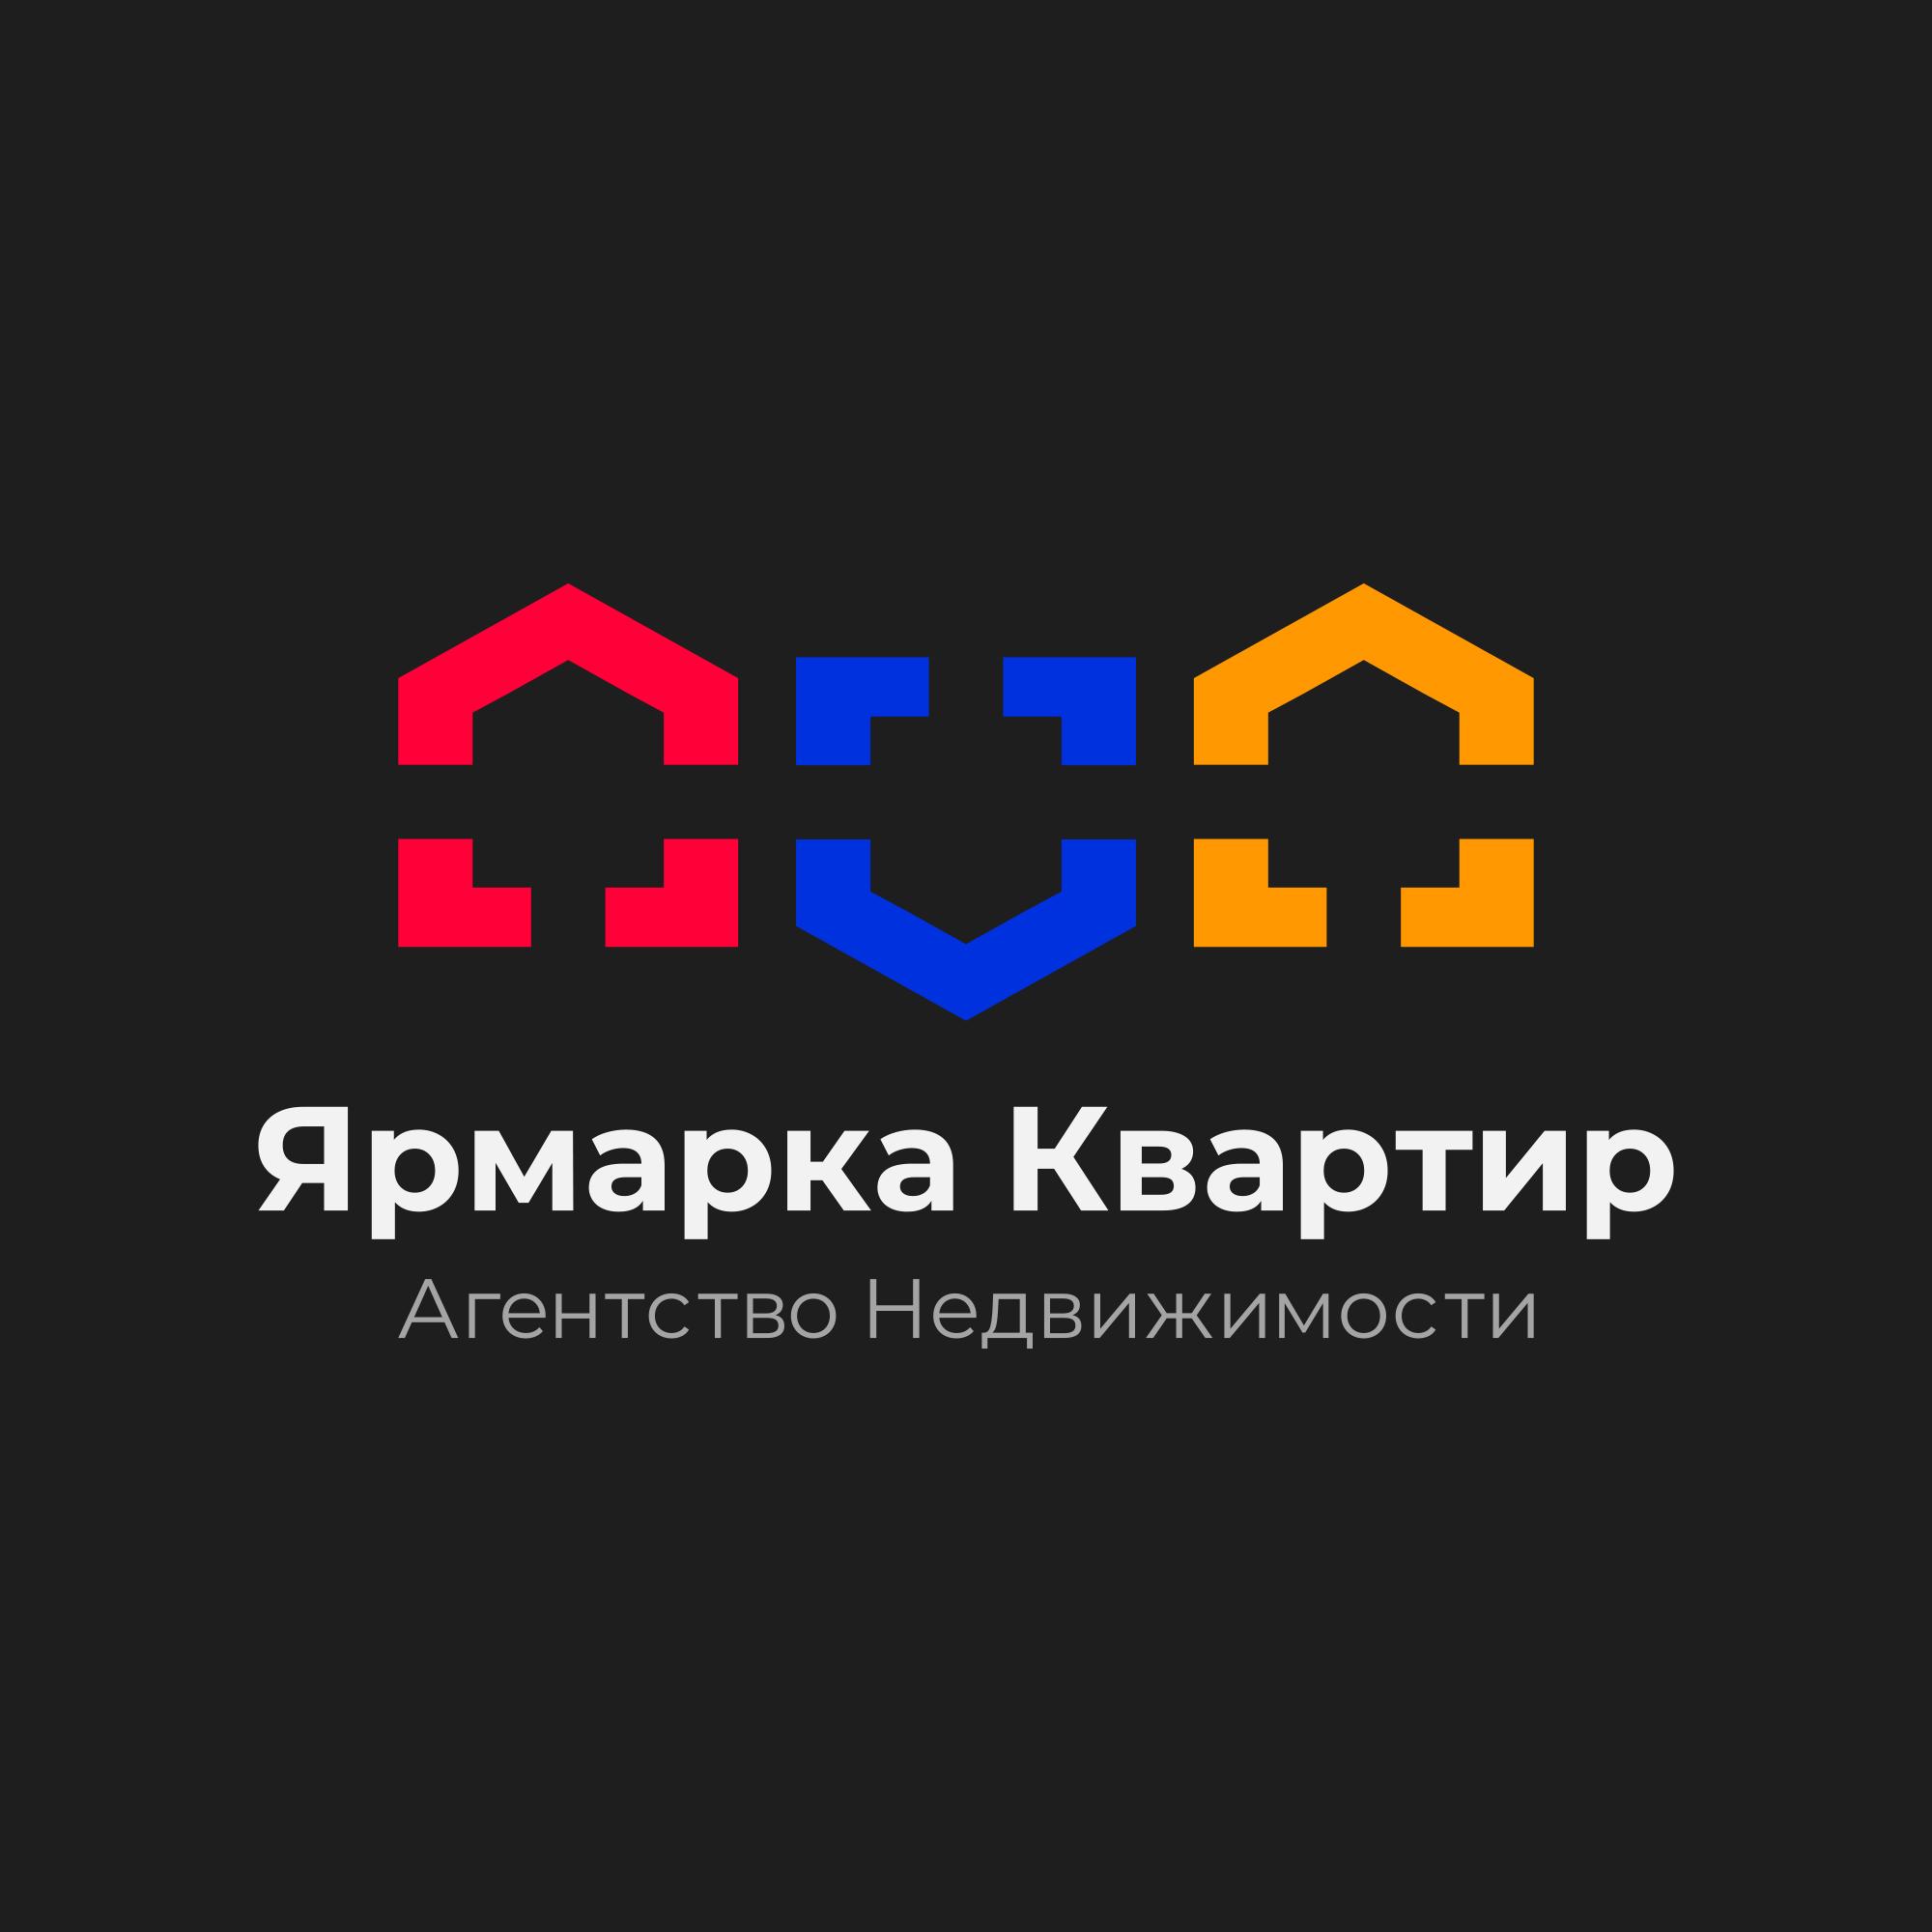 Создание логотипа, с вариантами для визитки и листовки фото f_335600821df73ddb.jpg